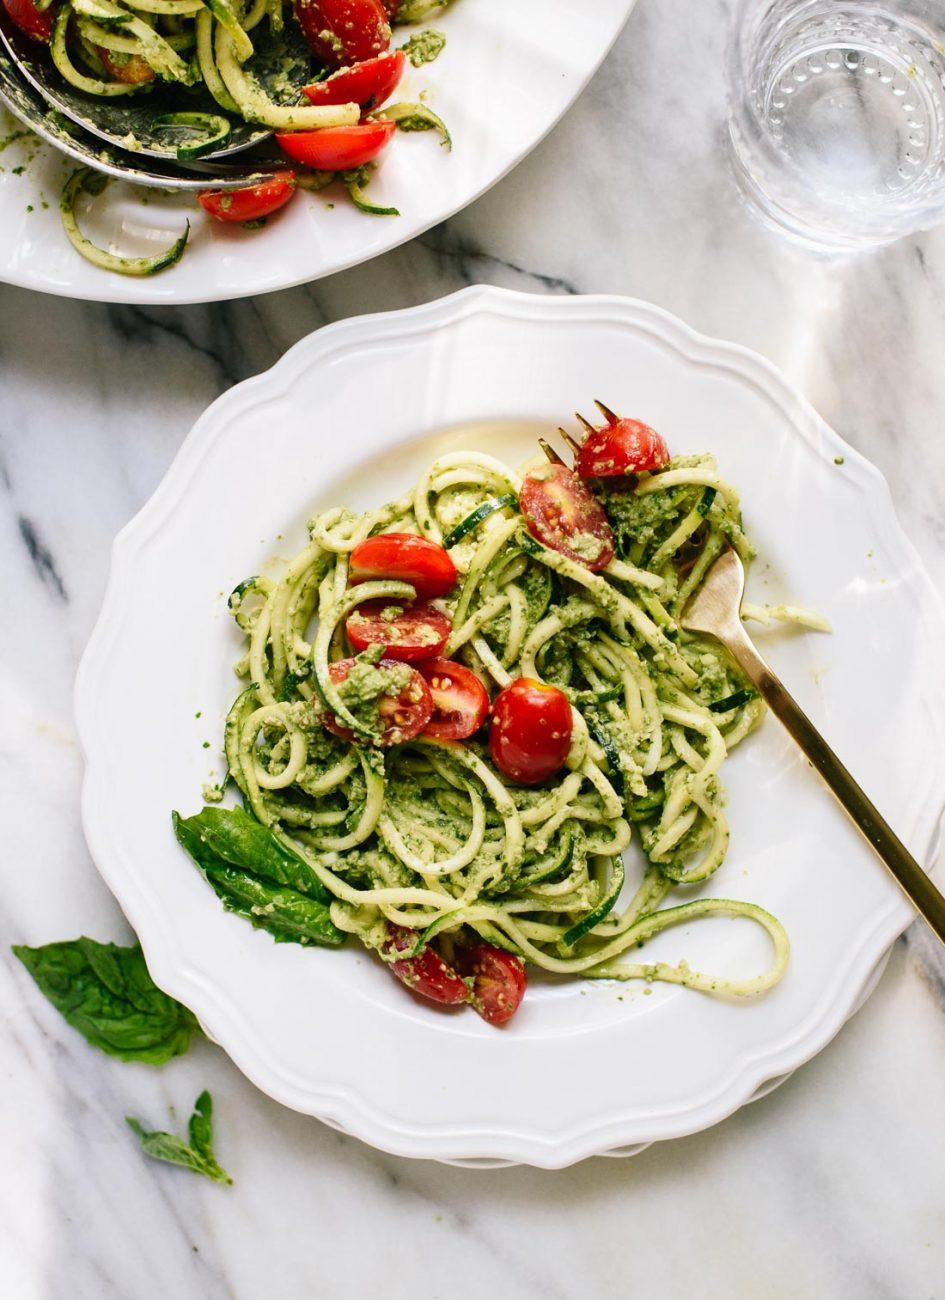 Спагетти из цукини с помидорами и соусом из базилика и орехов